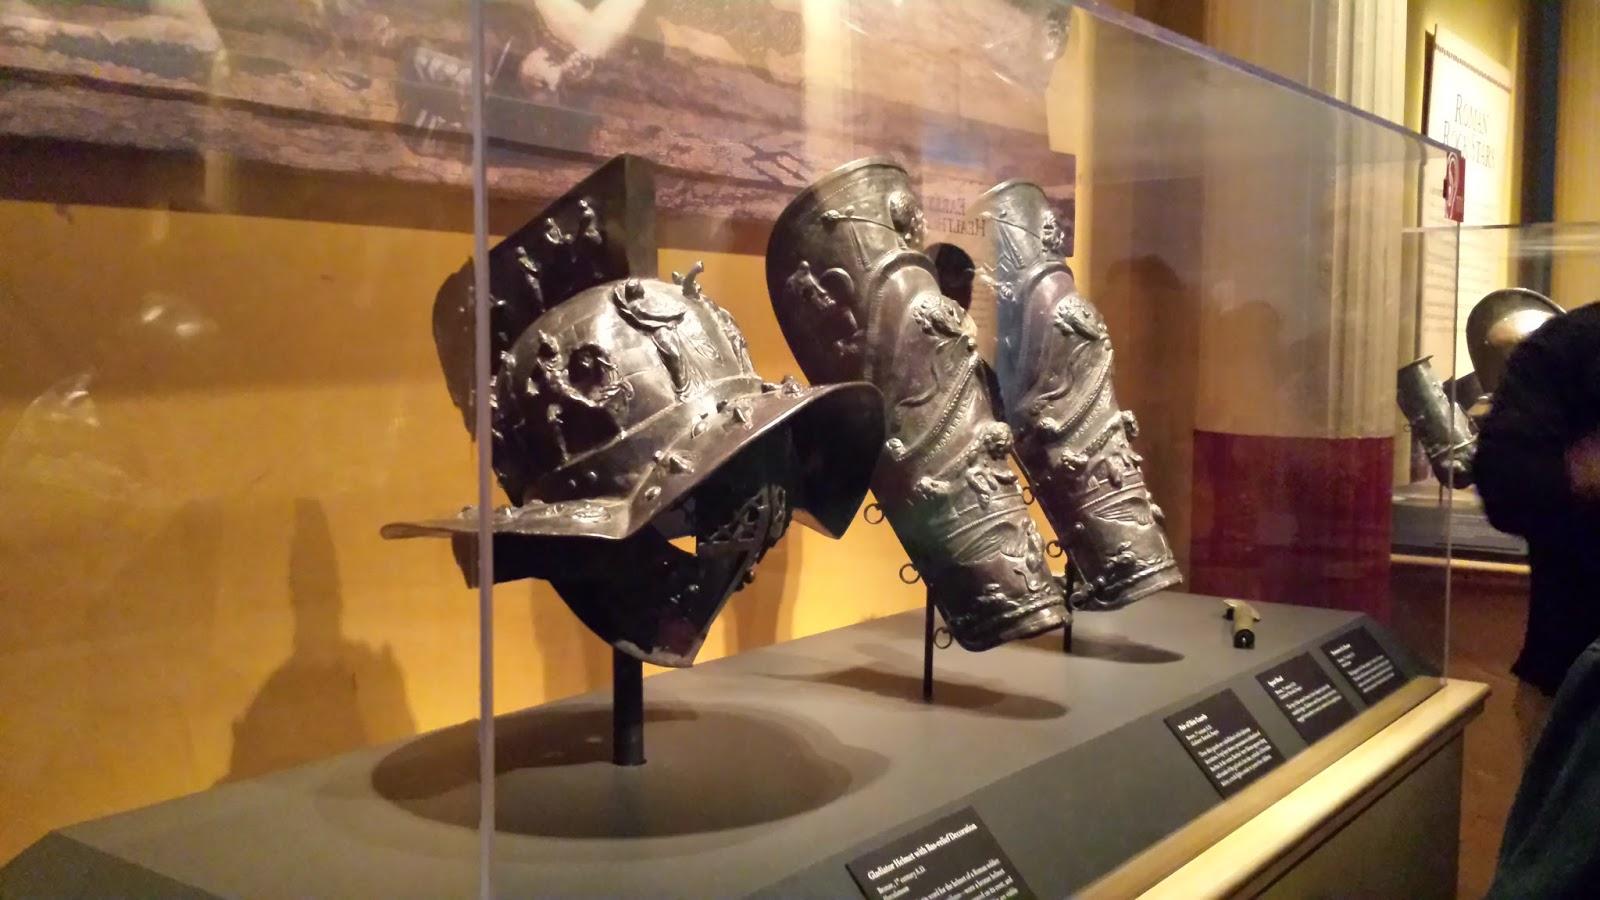 Gladiator armor